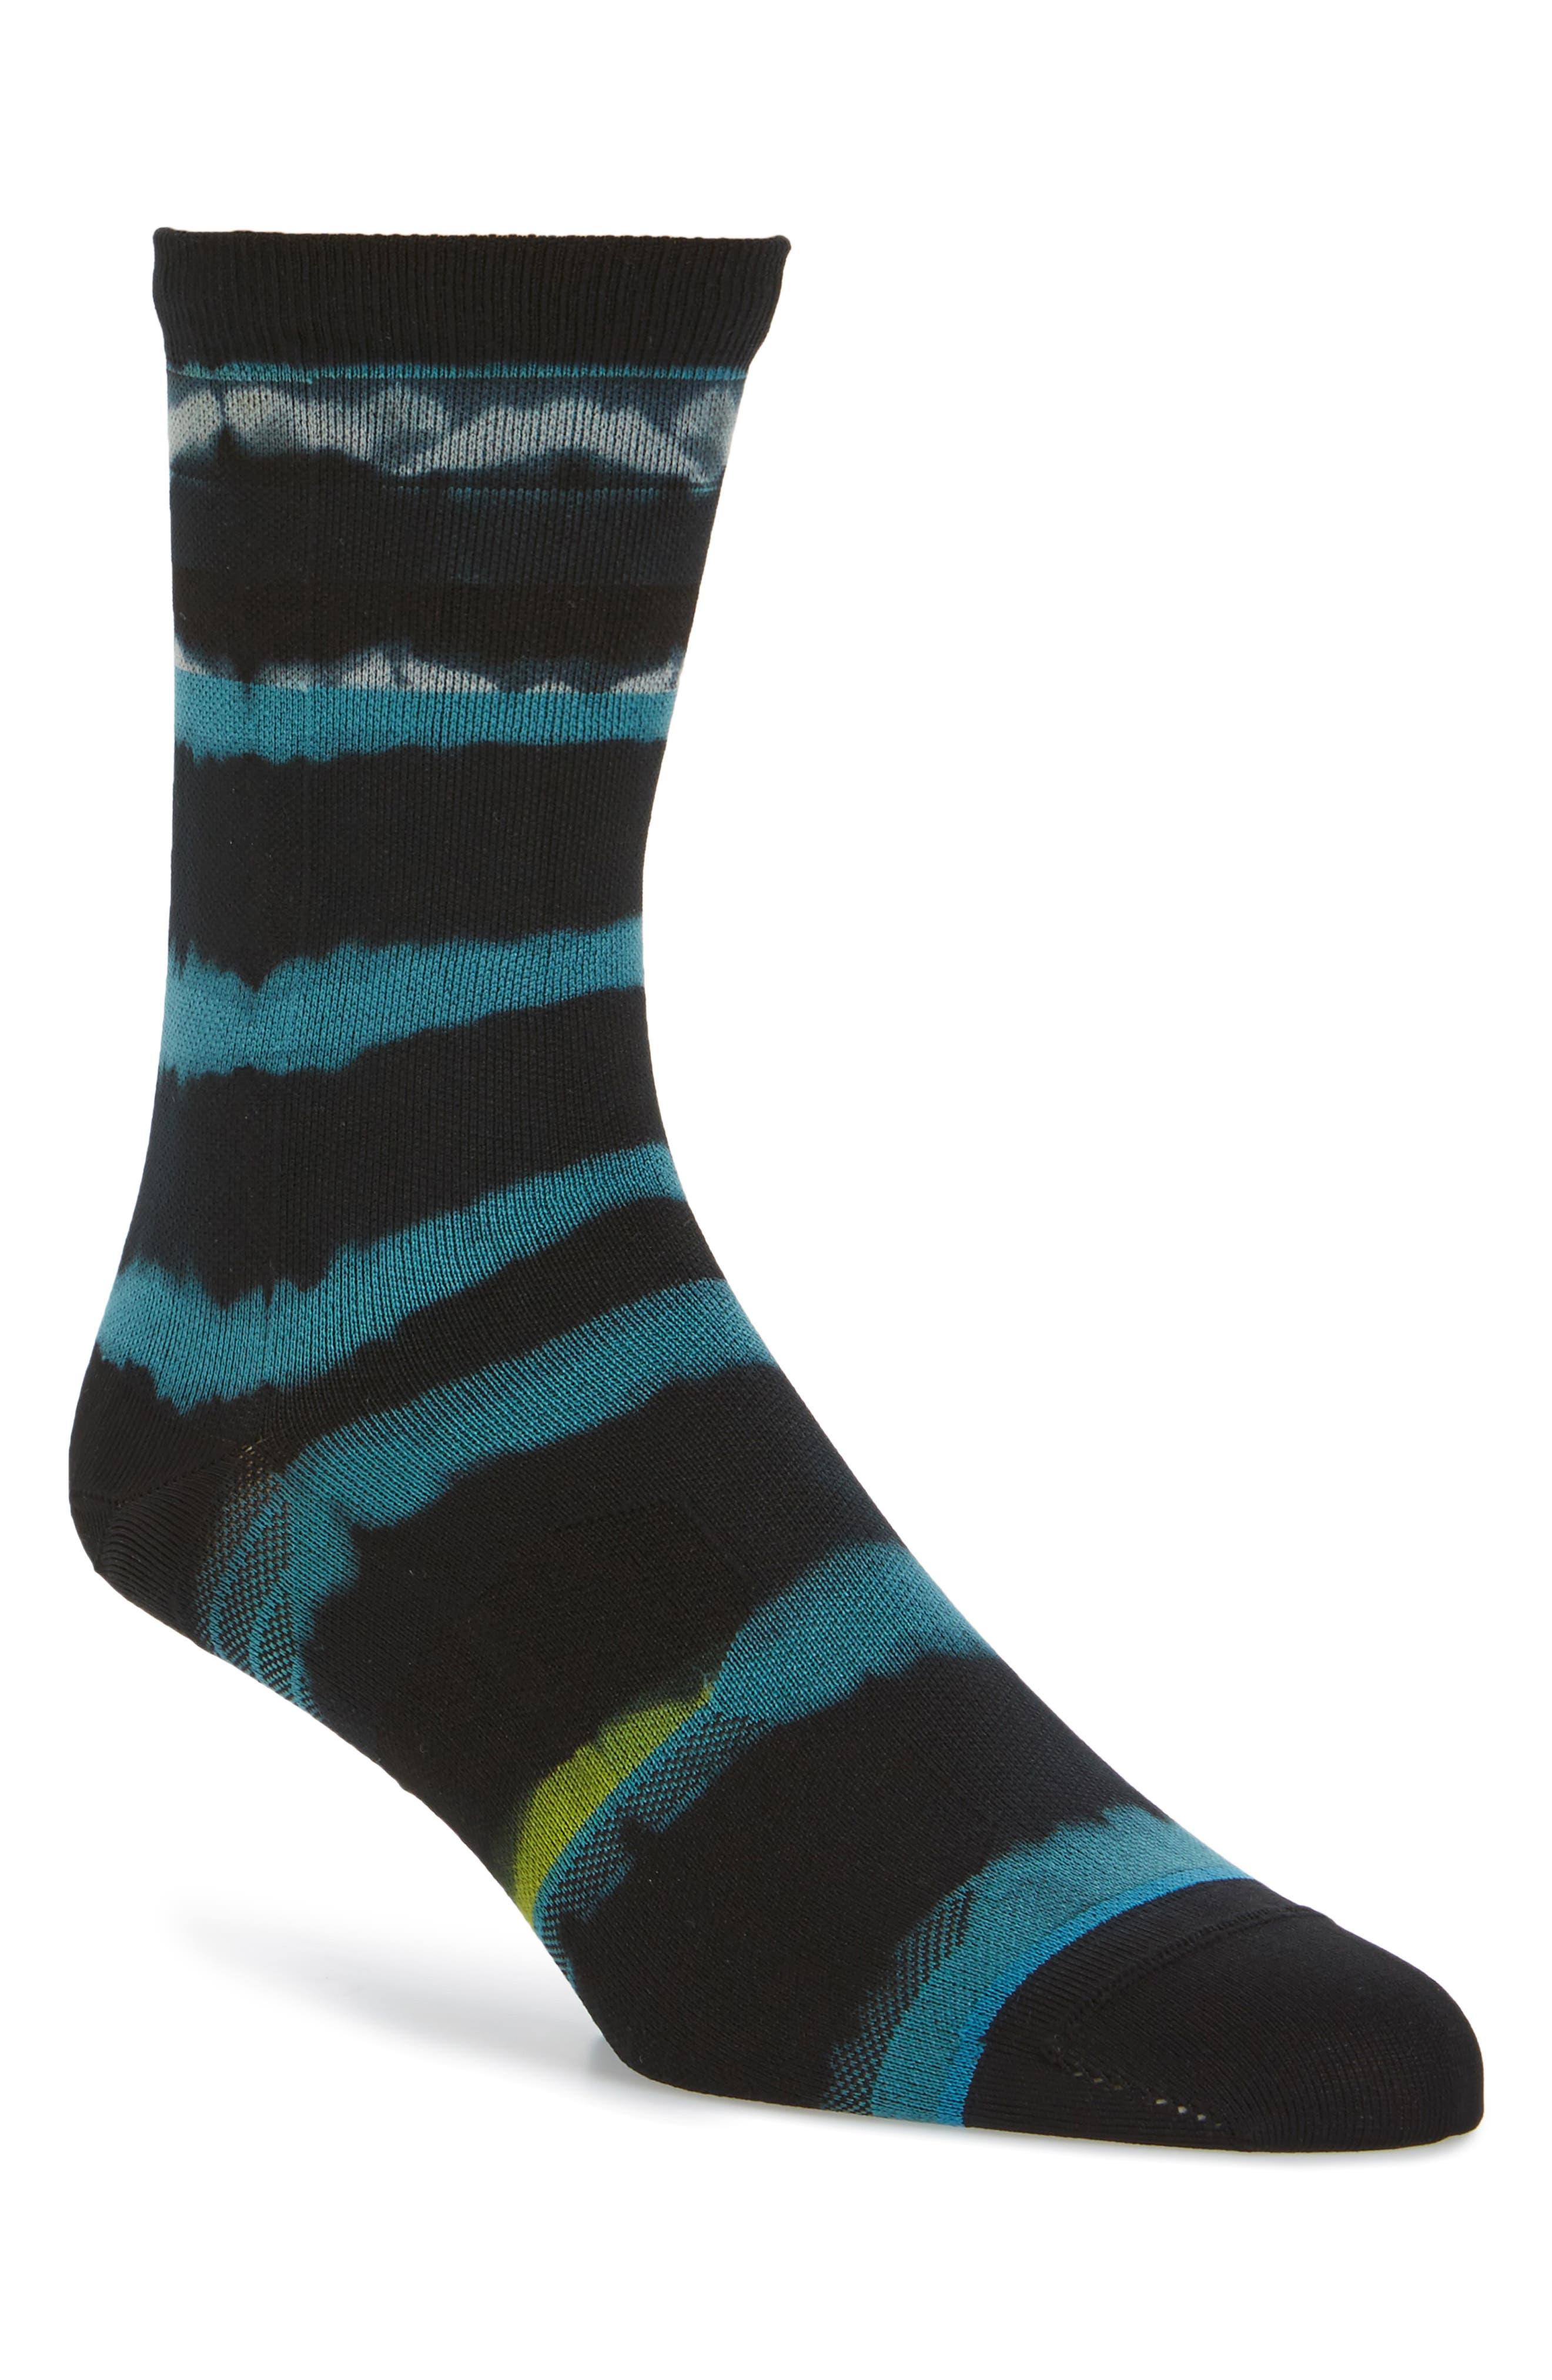 Main Image - Stance Empower Crew Socks